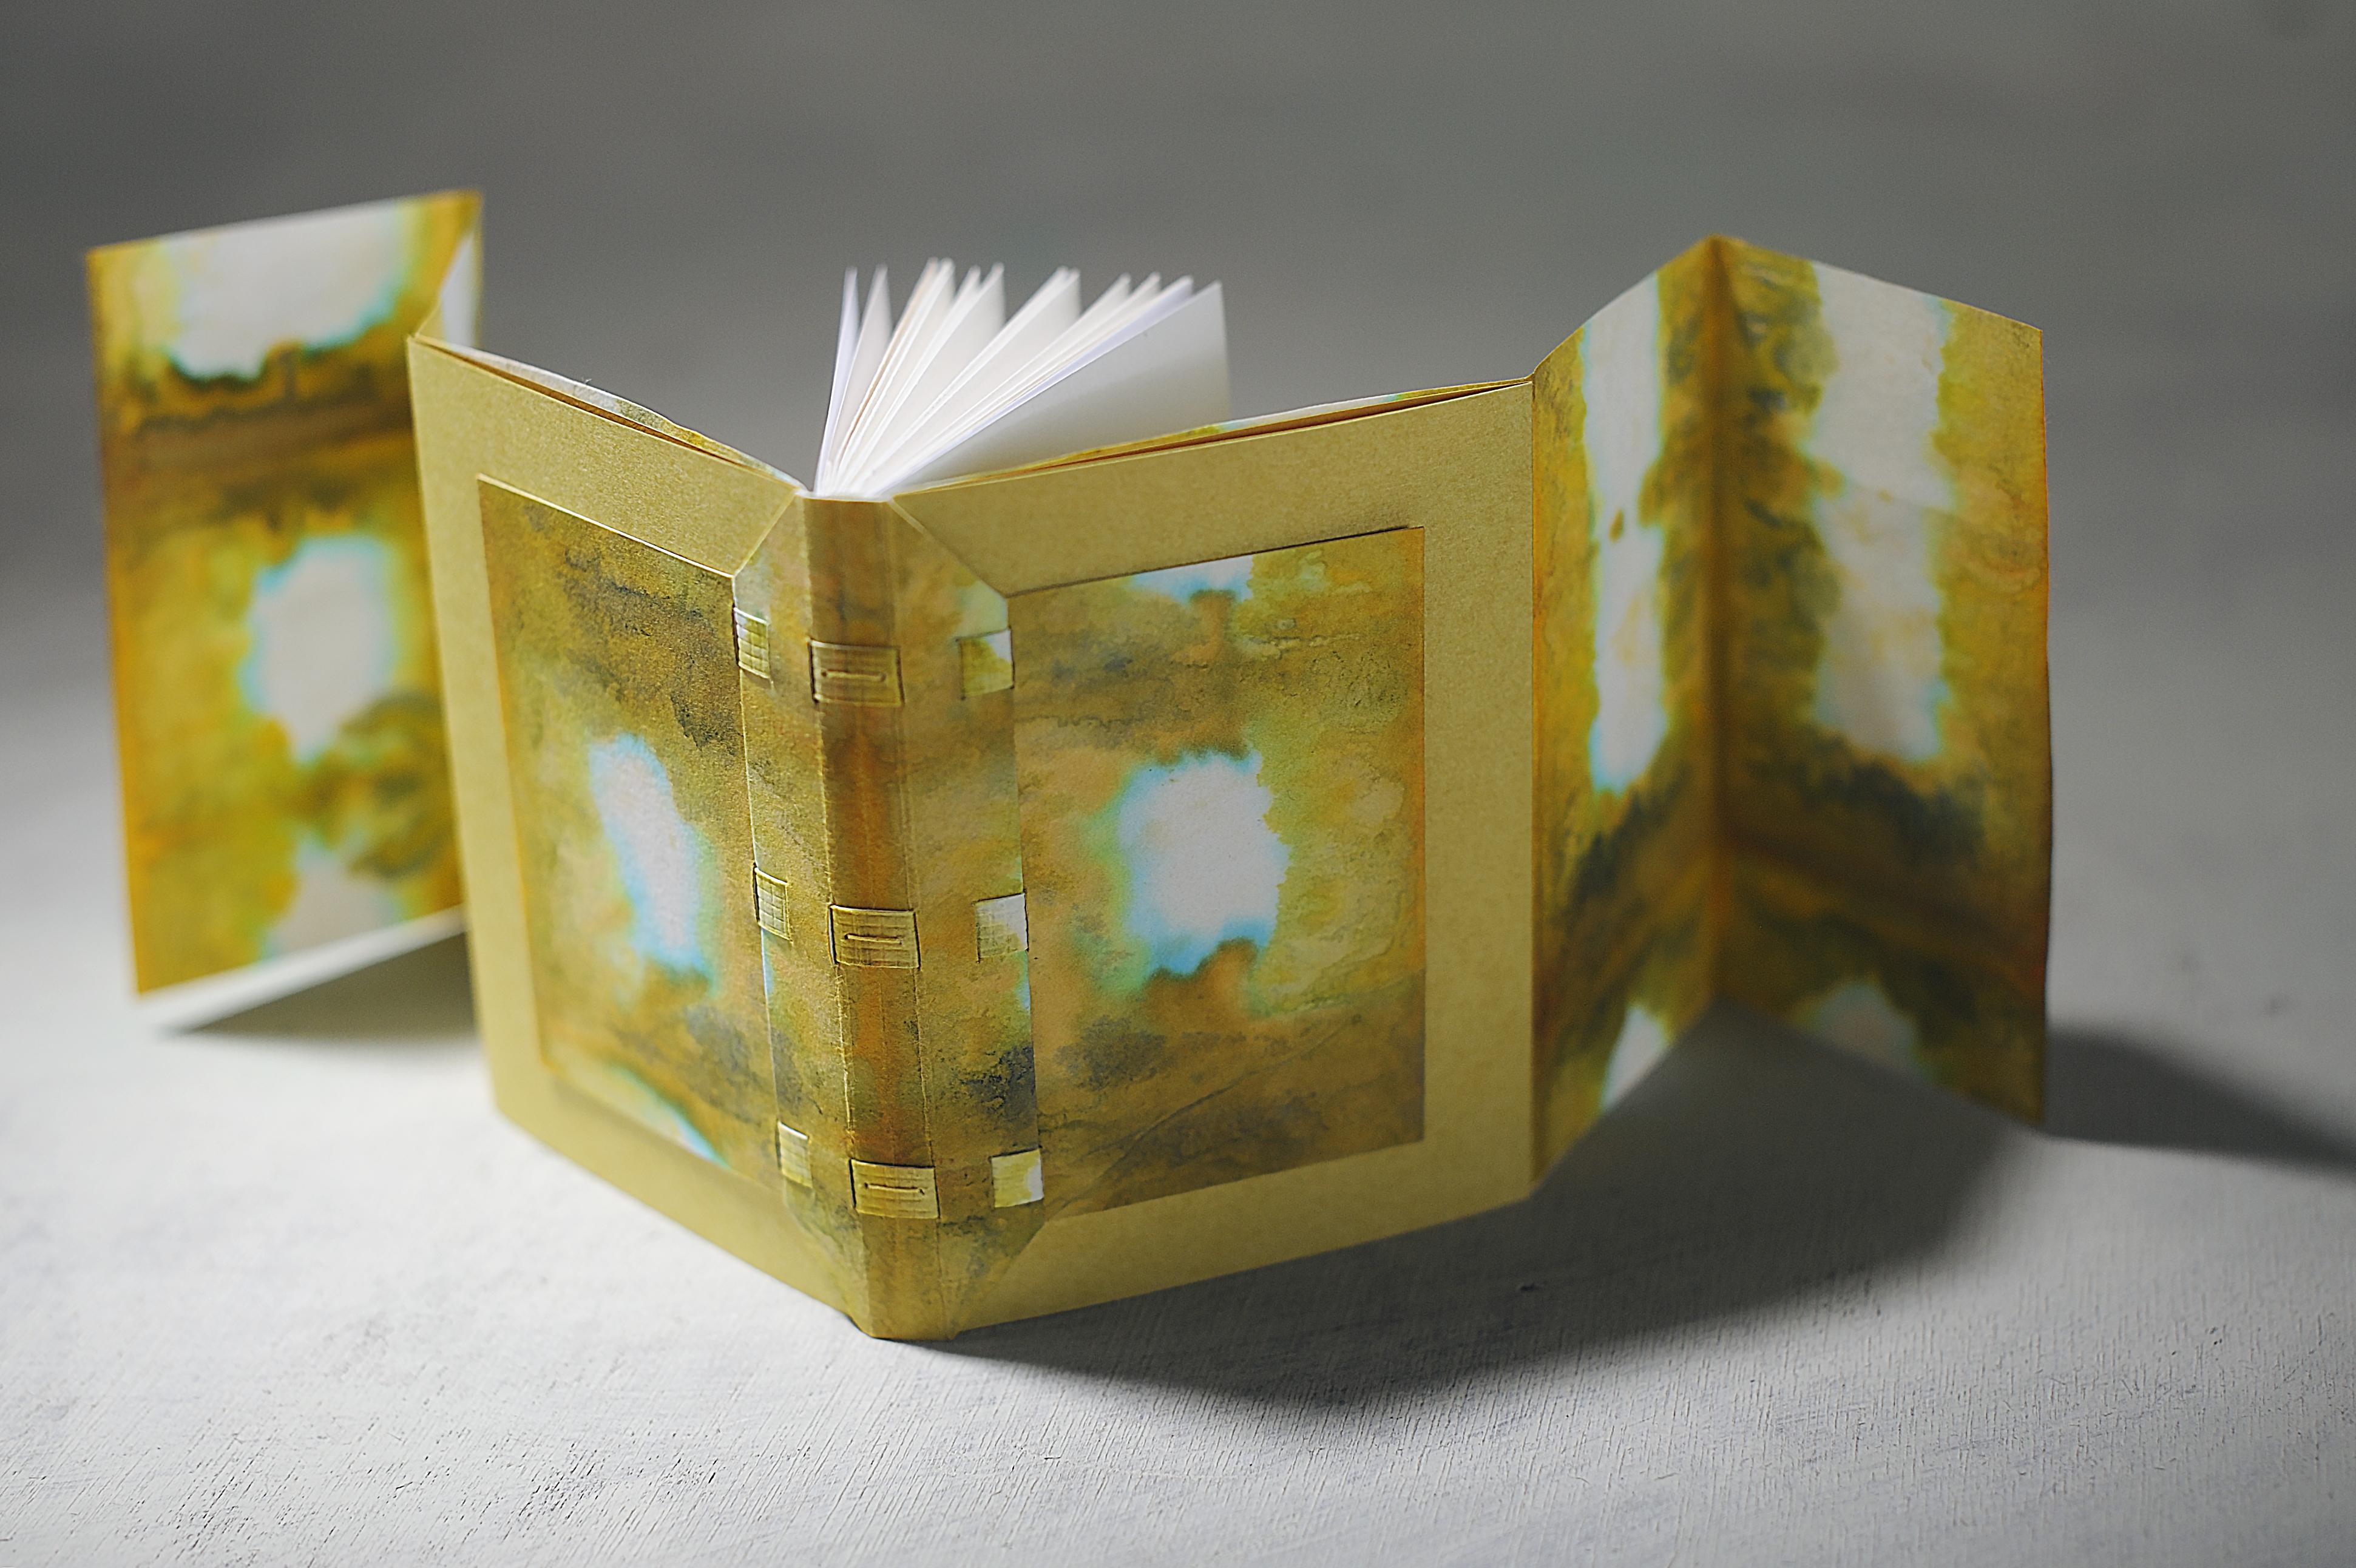 reliure-origata-papier, origata-binding, origata-bookbinding, orizomegami, reliure, bookbinding, reliure-art, reliure-creation, reliure-contemporaine, julie-auzillon